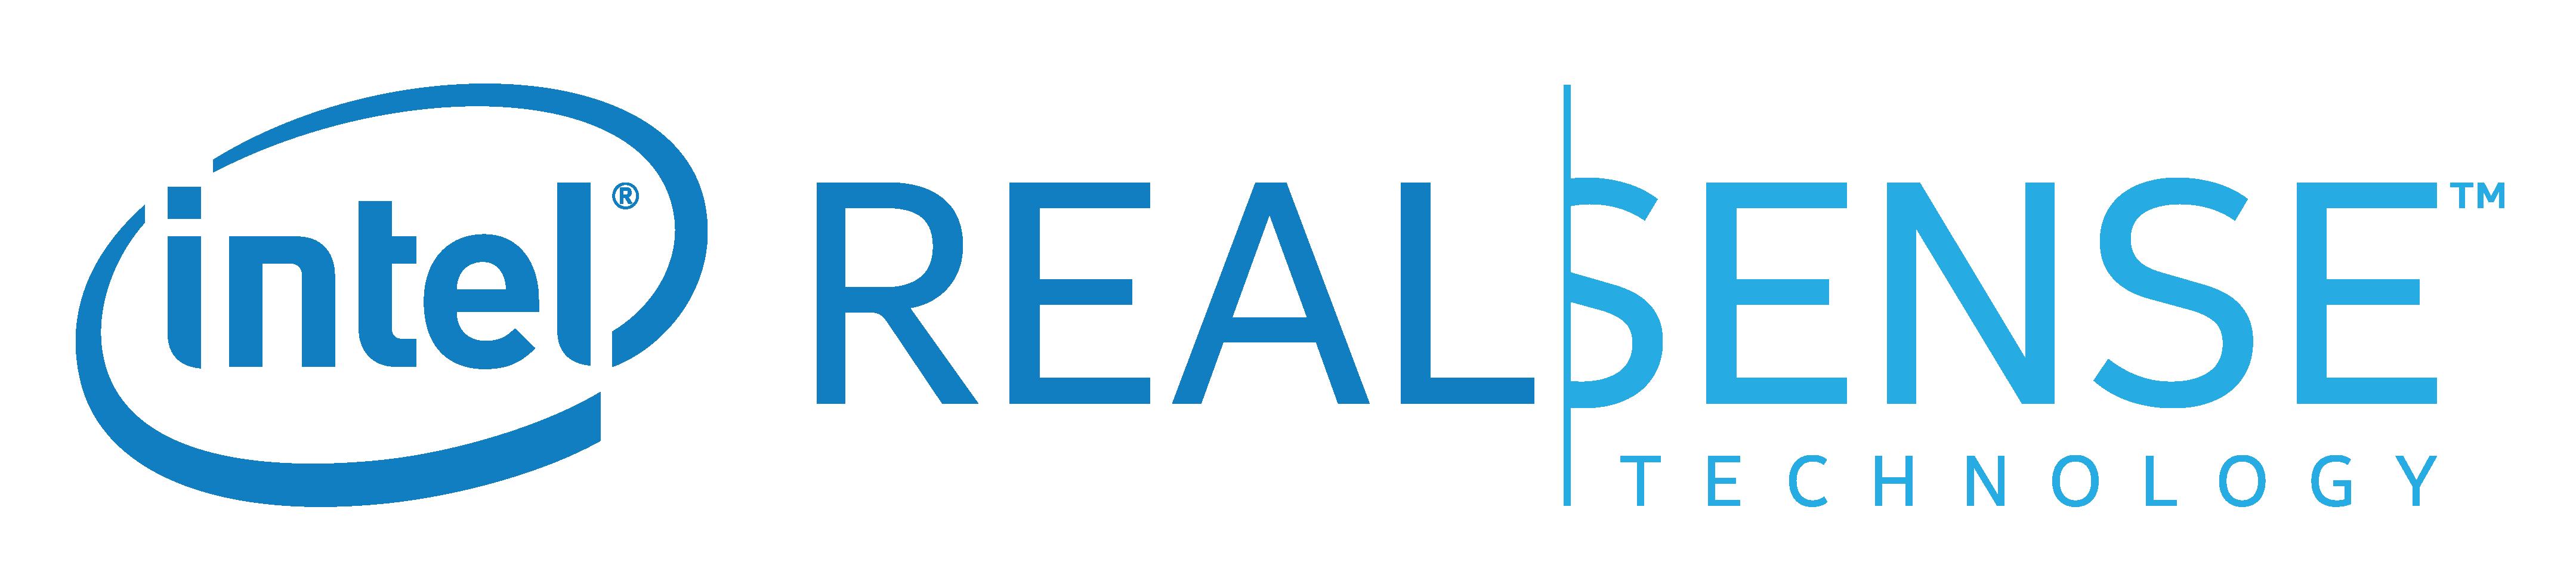 Intel_RealSense_Logo_ColorPStYqseiUvWcu